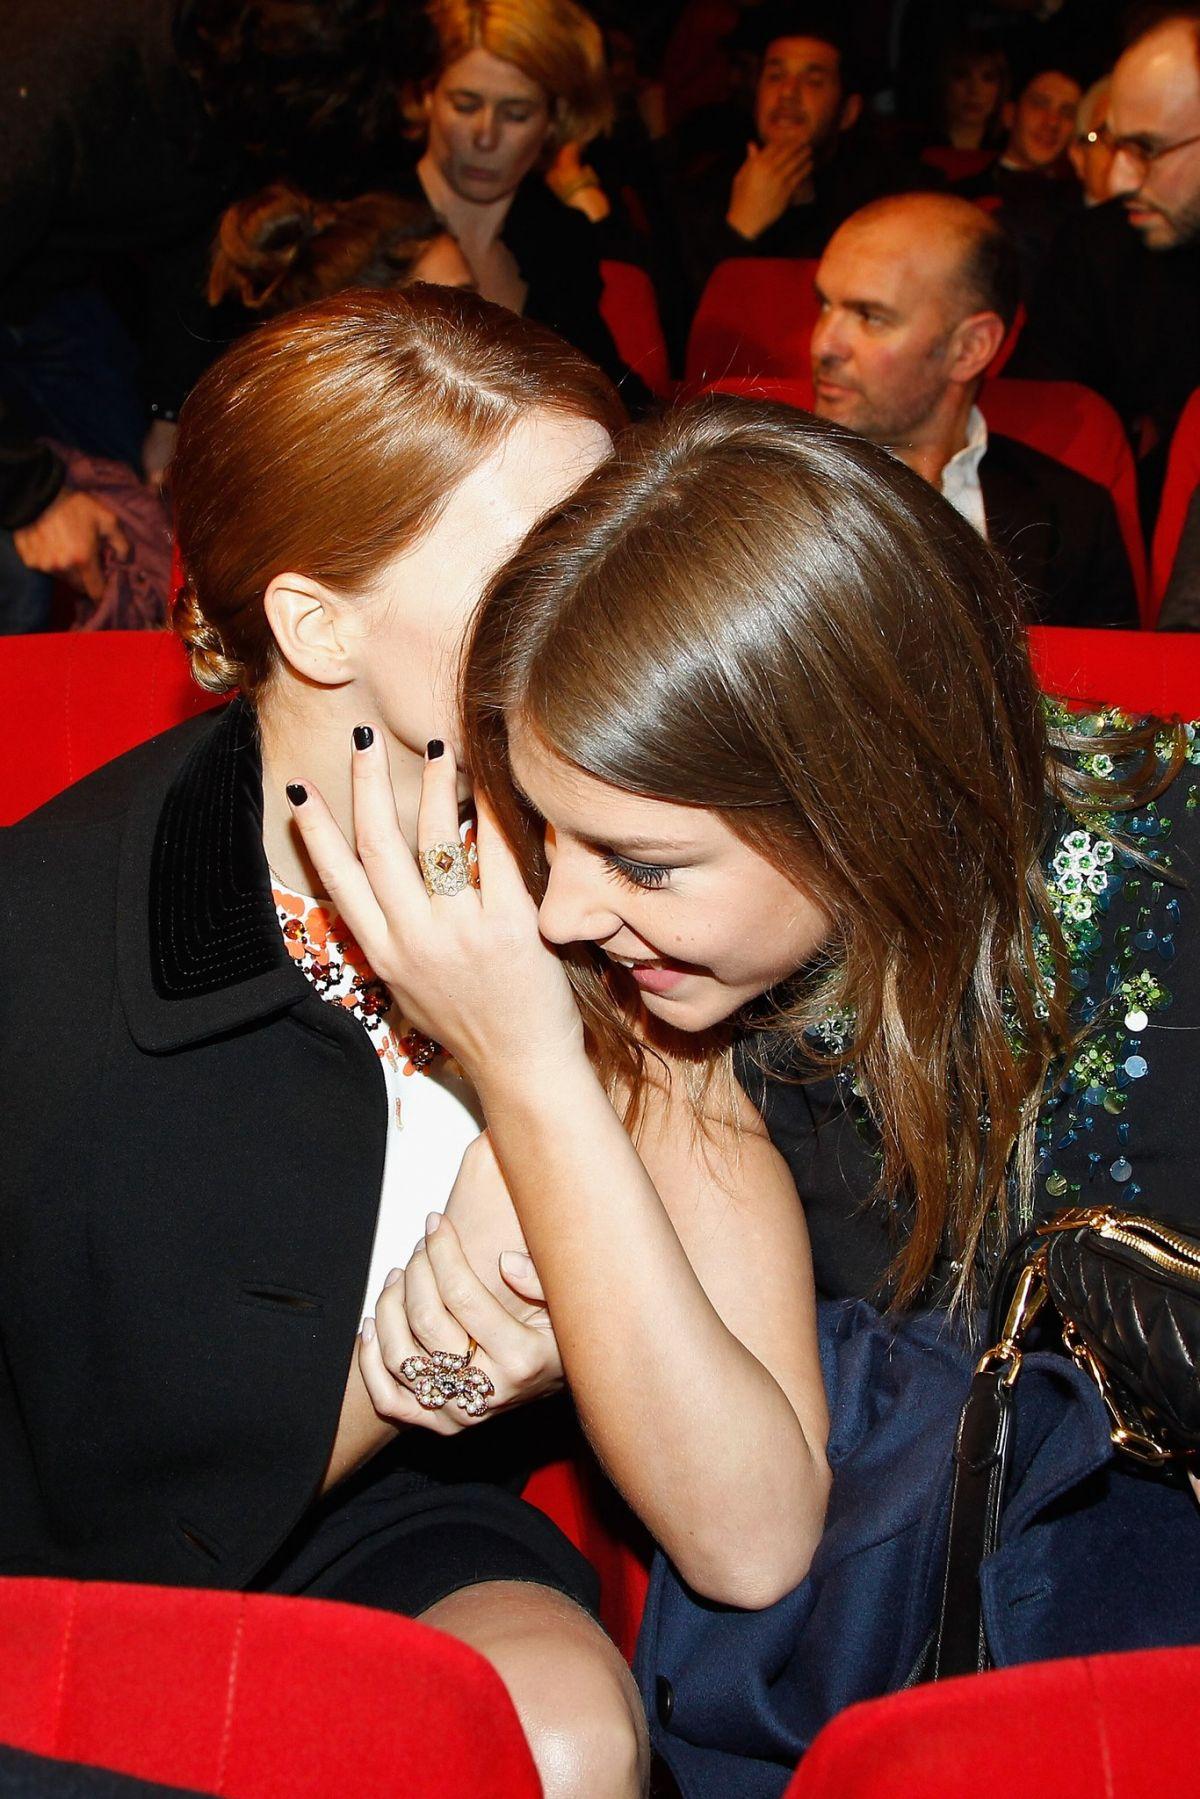 Adele exarchopoulos and lea seydoux nude lesbo scene 9